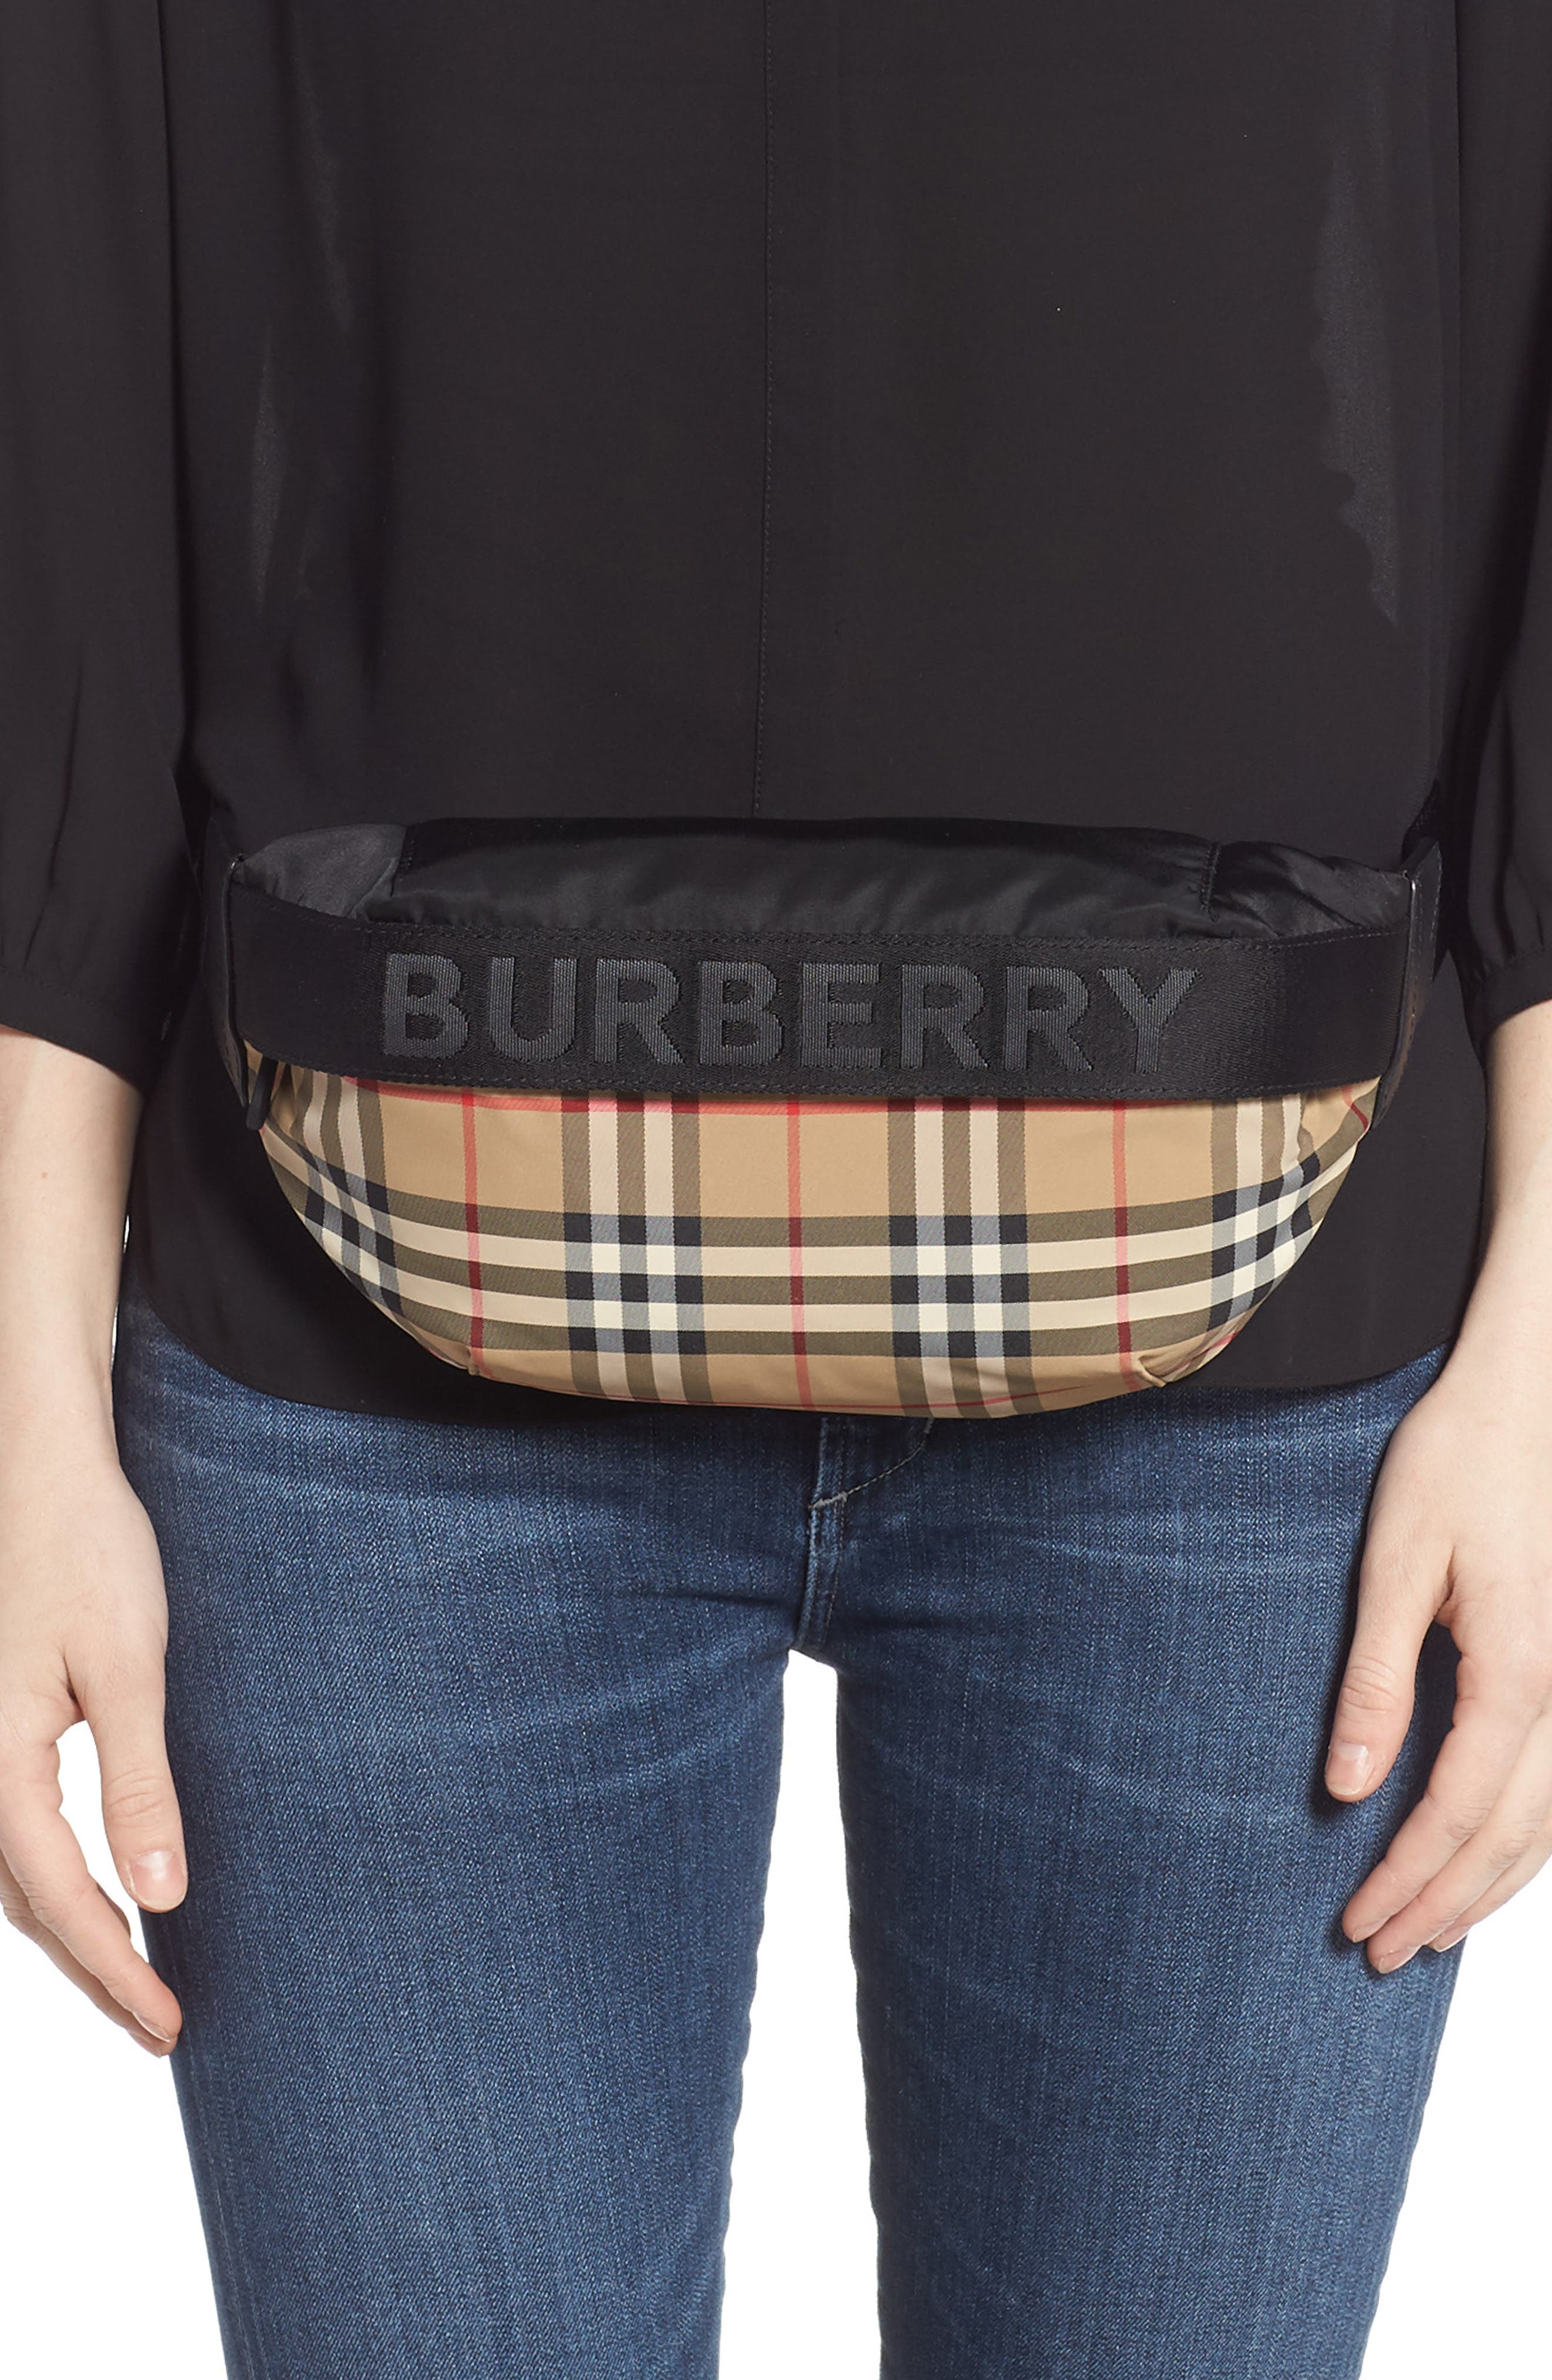 BURBERRY,                             Burberrry Medium Sonny Vintage Check Belt Bag,                             Alternate thumbnail 2, color,                             ARCHIVE BEIGE